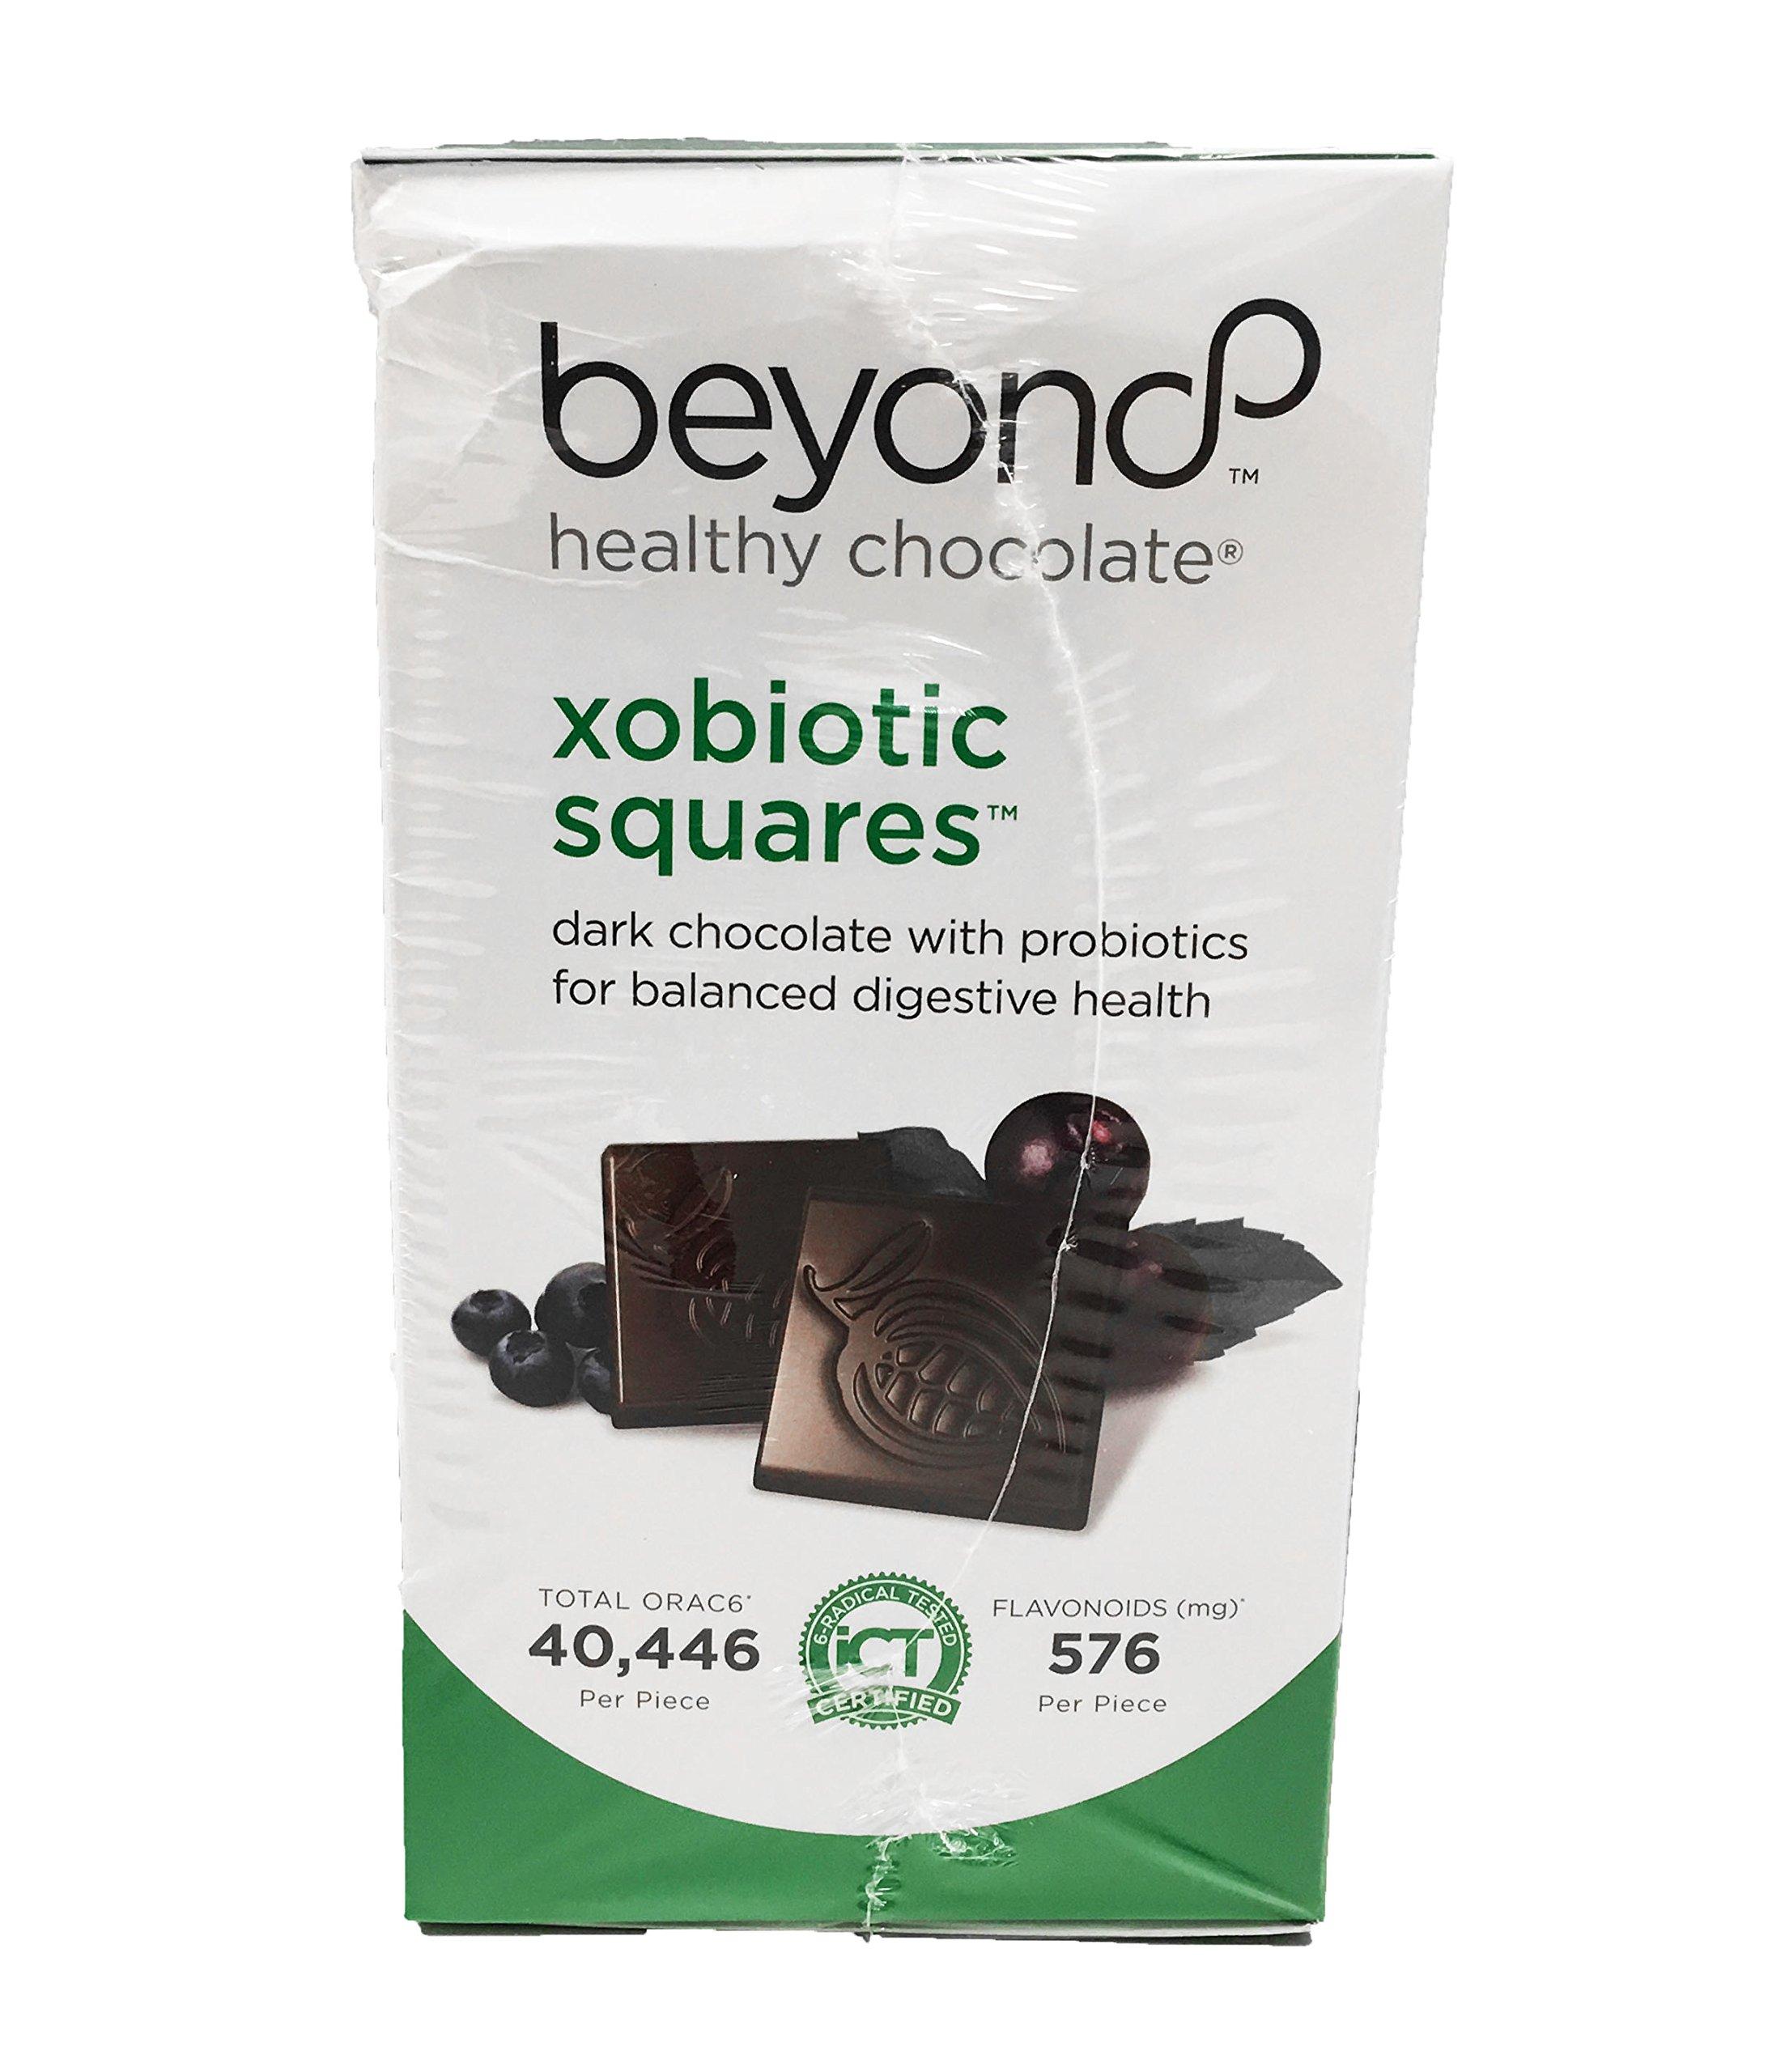 Beyond Healthy Chocolate Xobiotic Squares 120 Pieces 1 lb